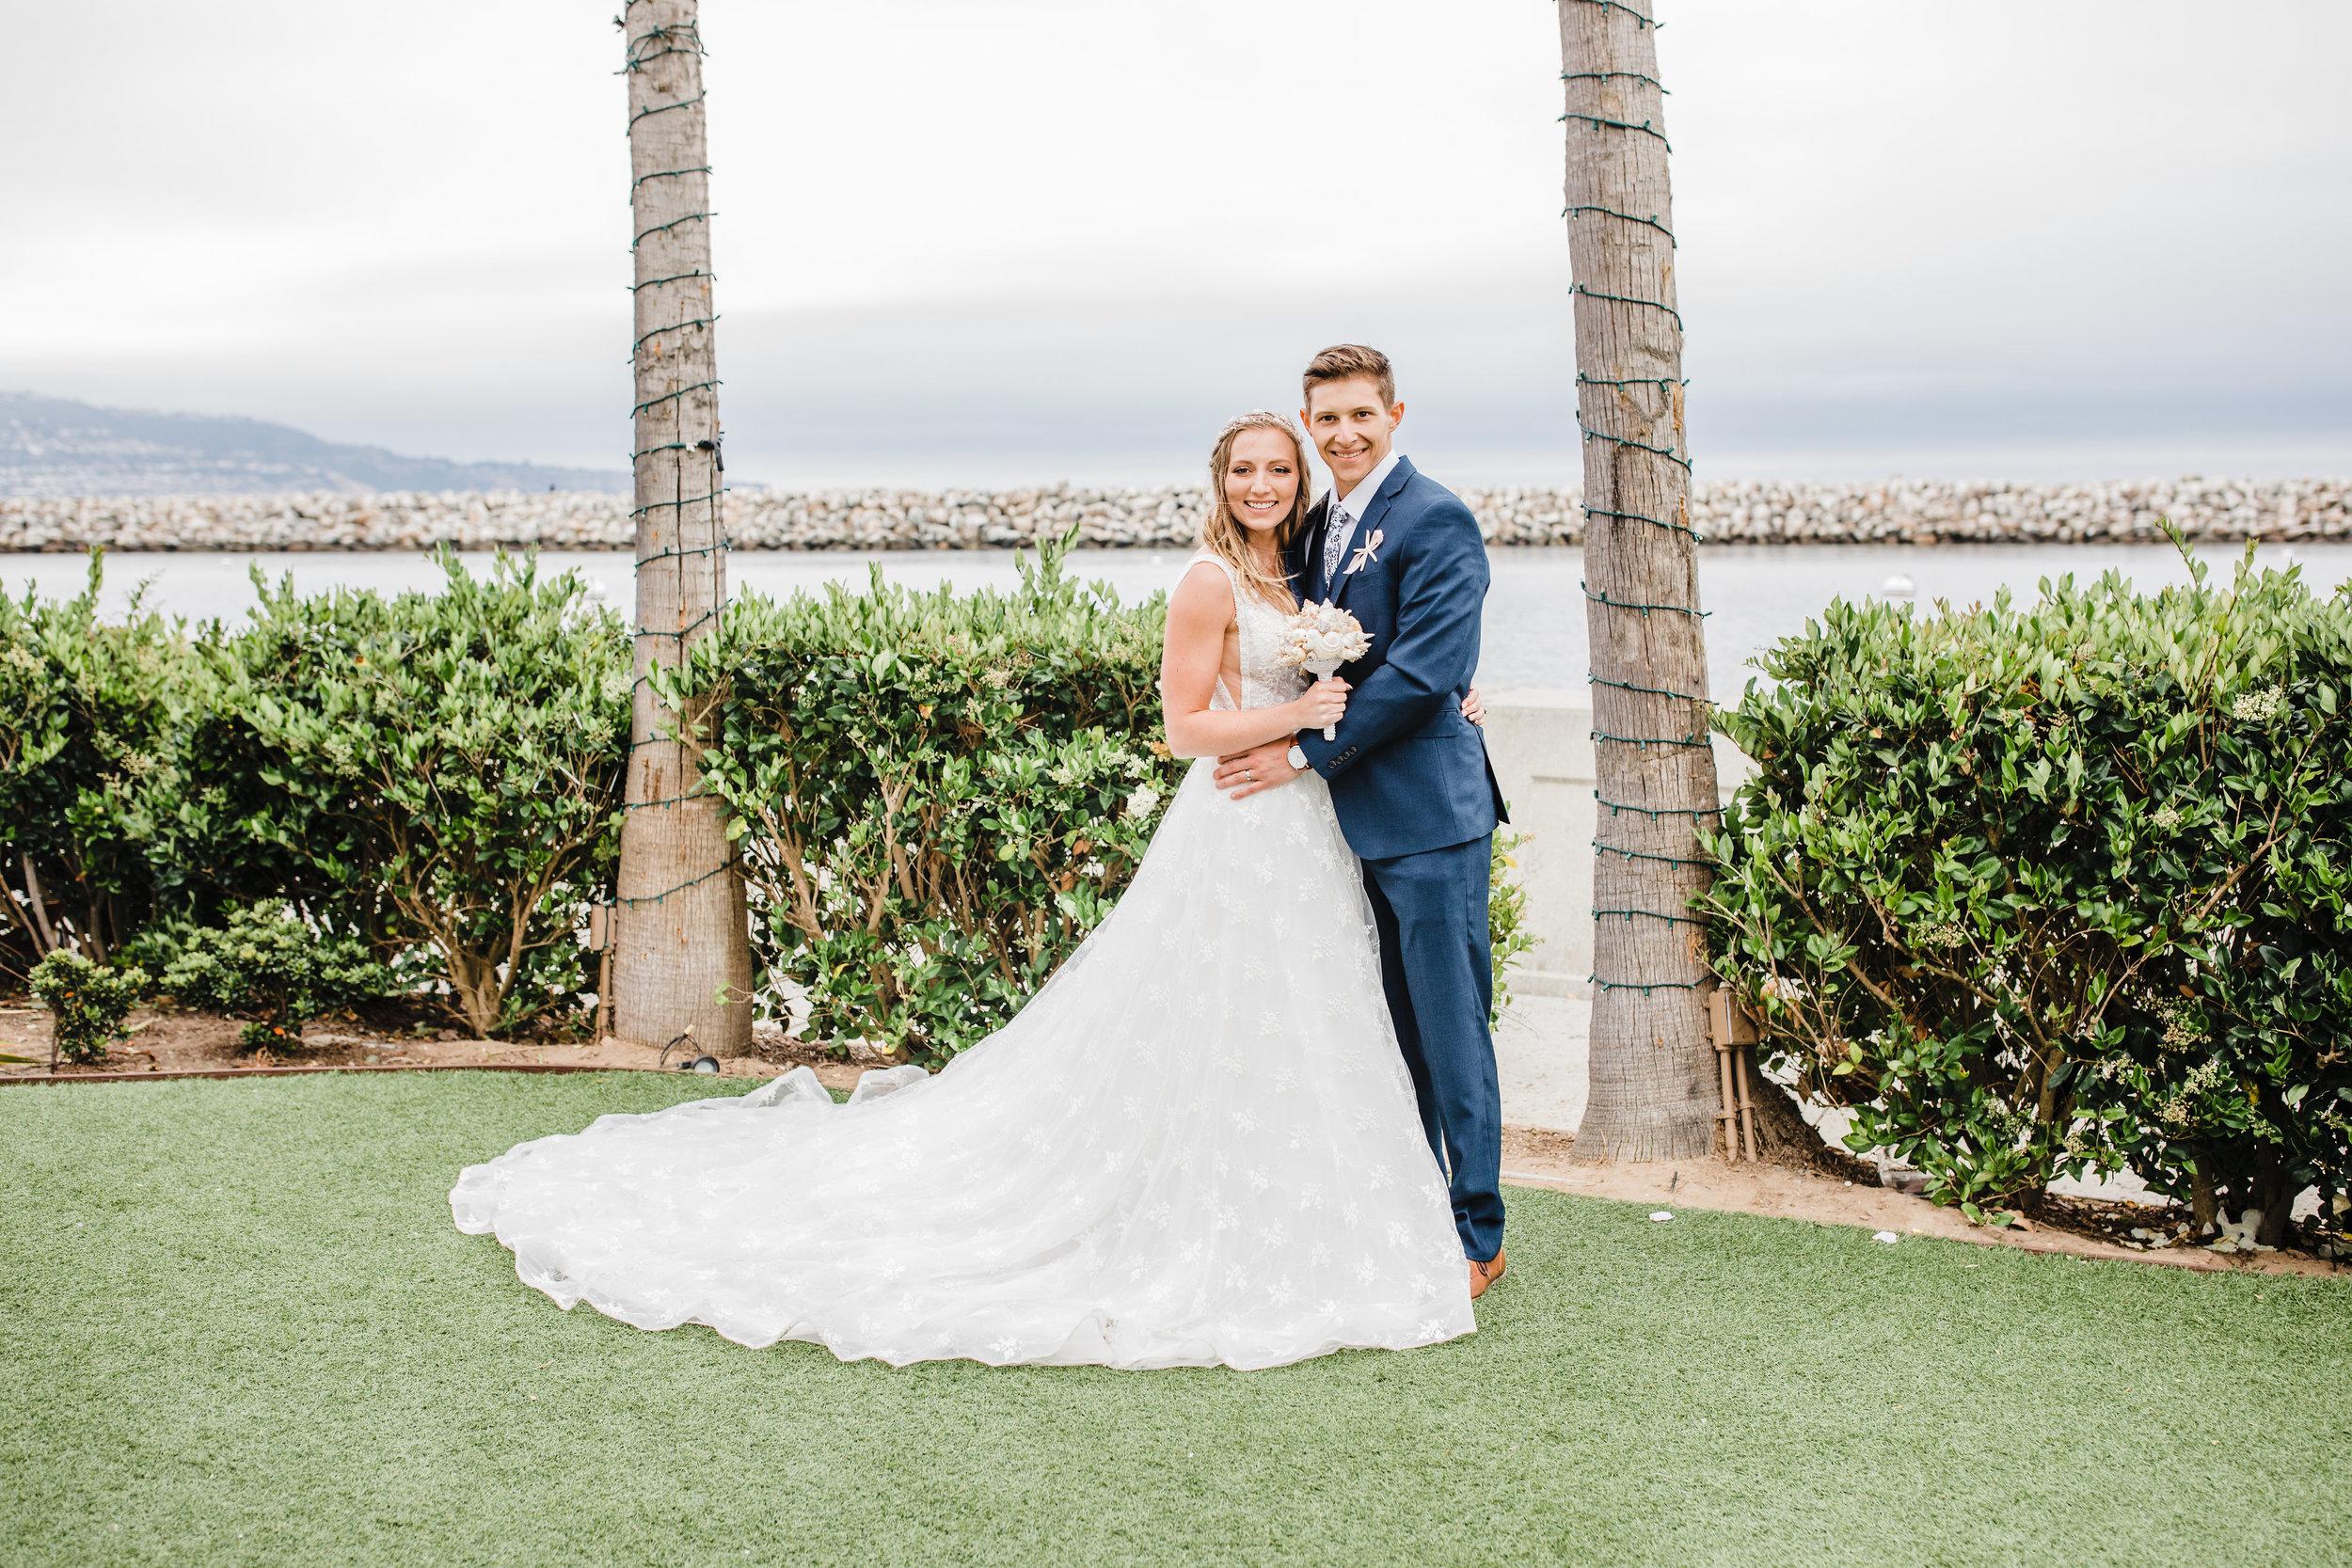 professional wedding photographer in park city utah wedding dress train bride and groom palm tree beach wedding smiling